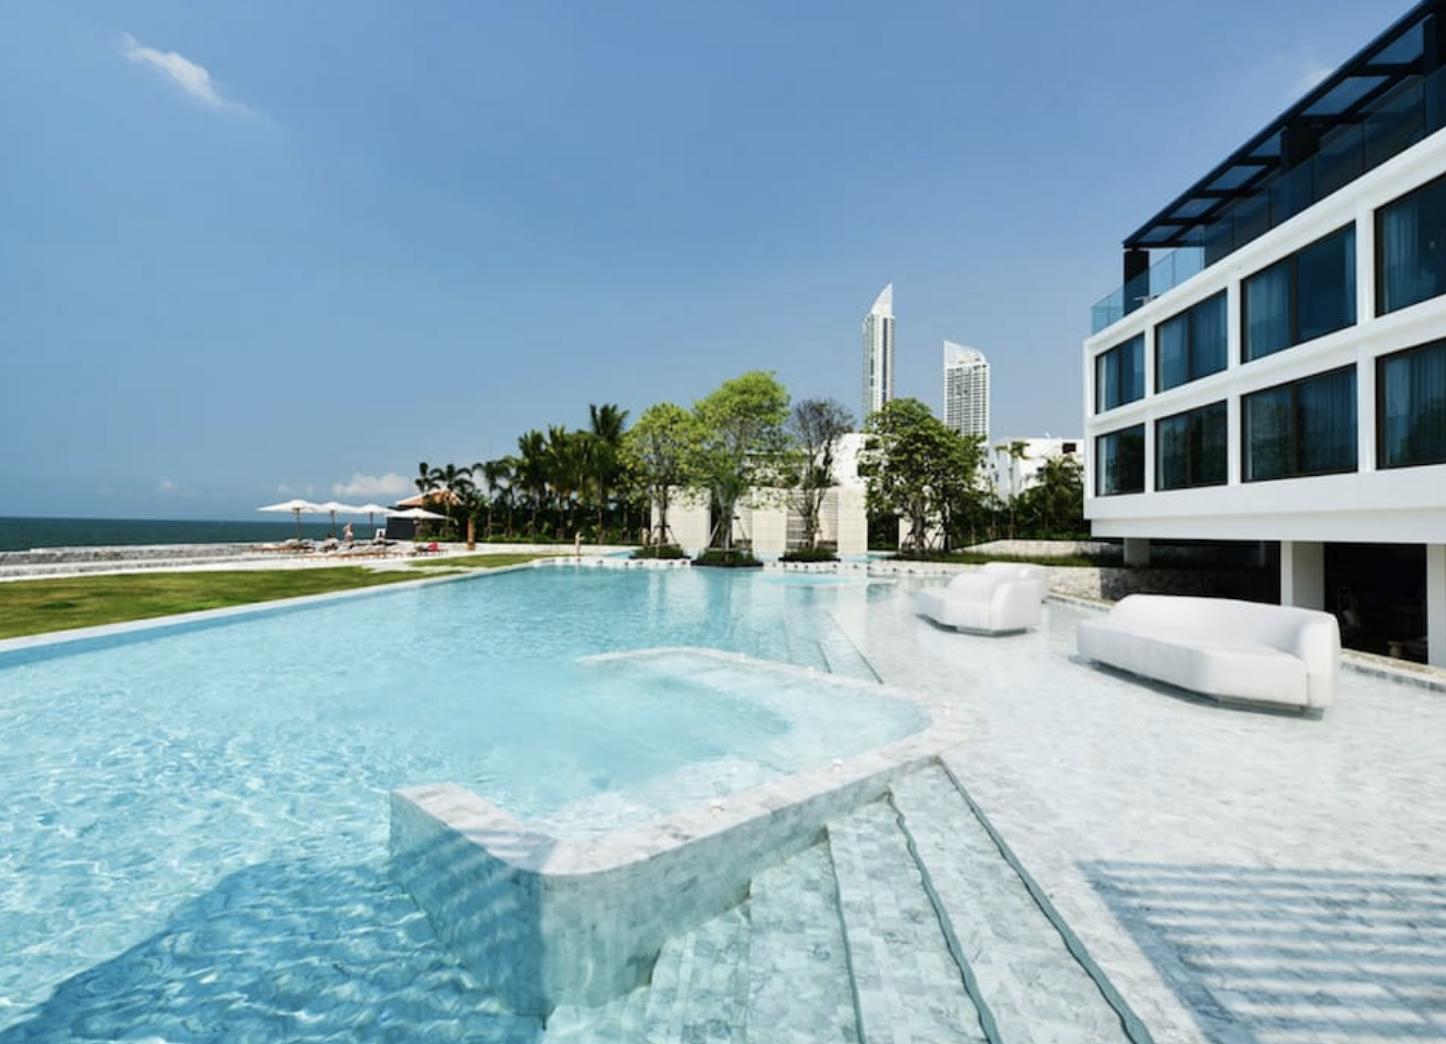 Veranda Residence 22nd Fl 3 BR Amazing Sea Views